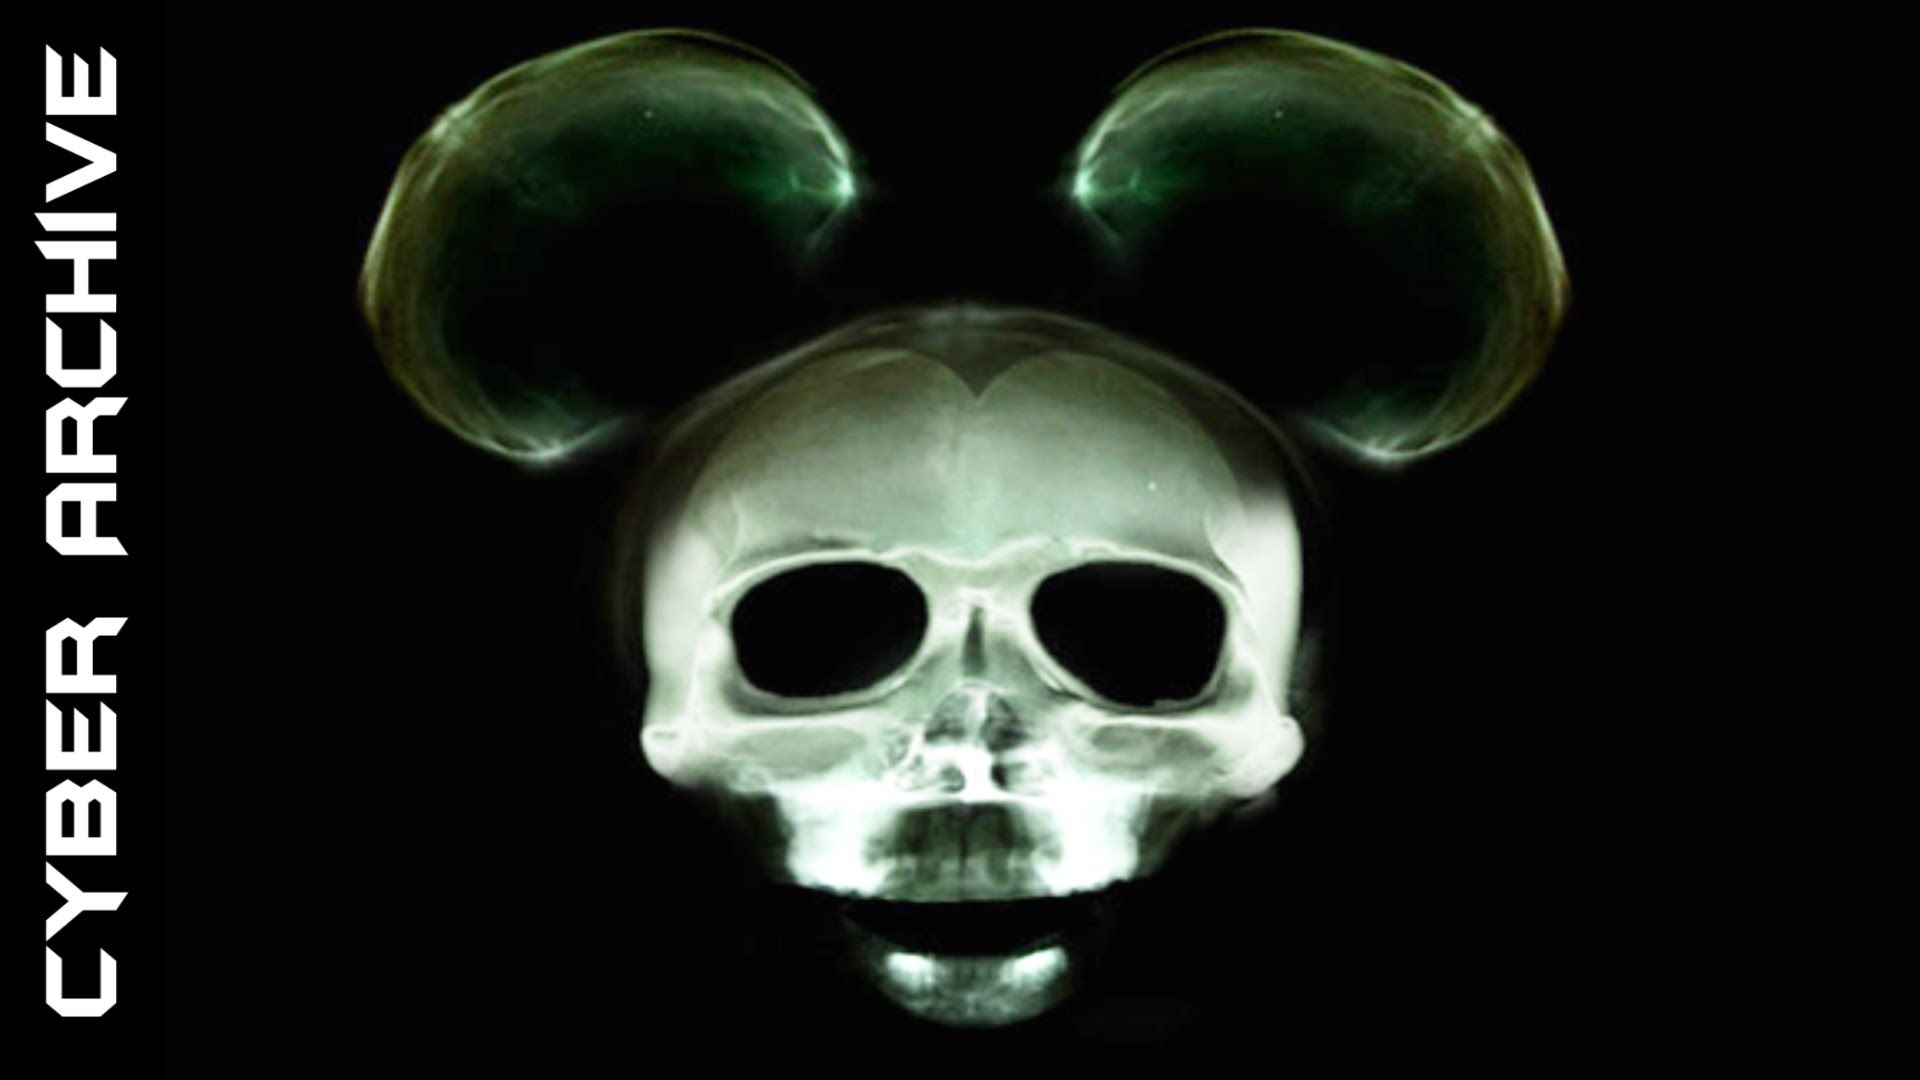 Dark Disturbing Disney Secrets BIZARRE Pinterest Disney - 24 disney movies secrets